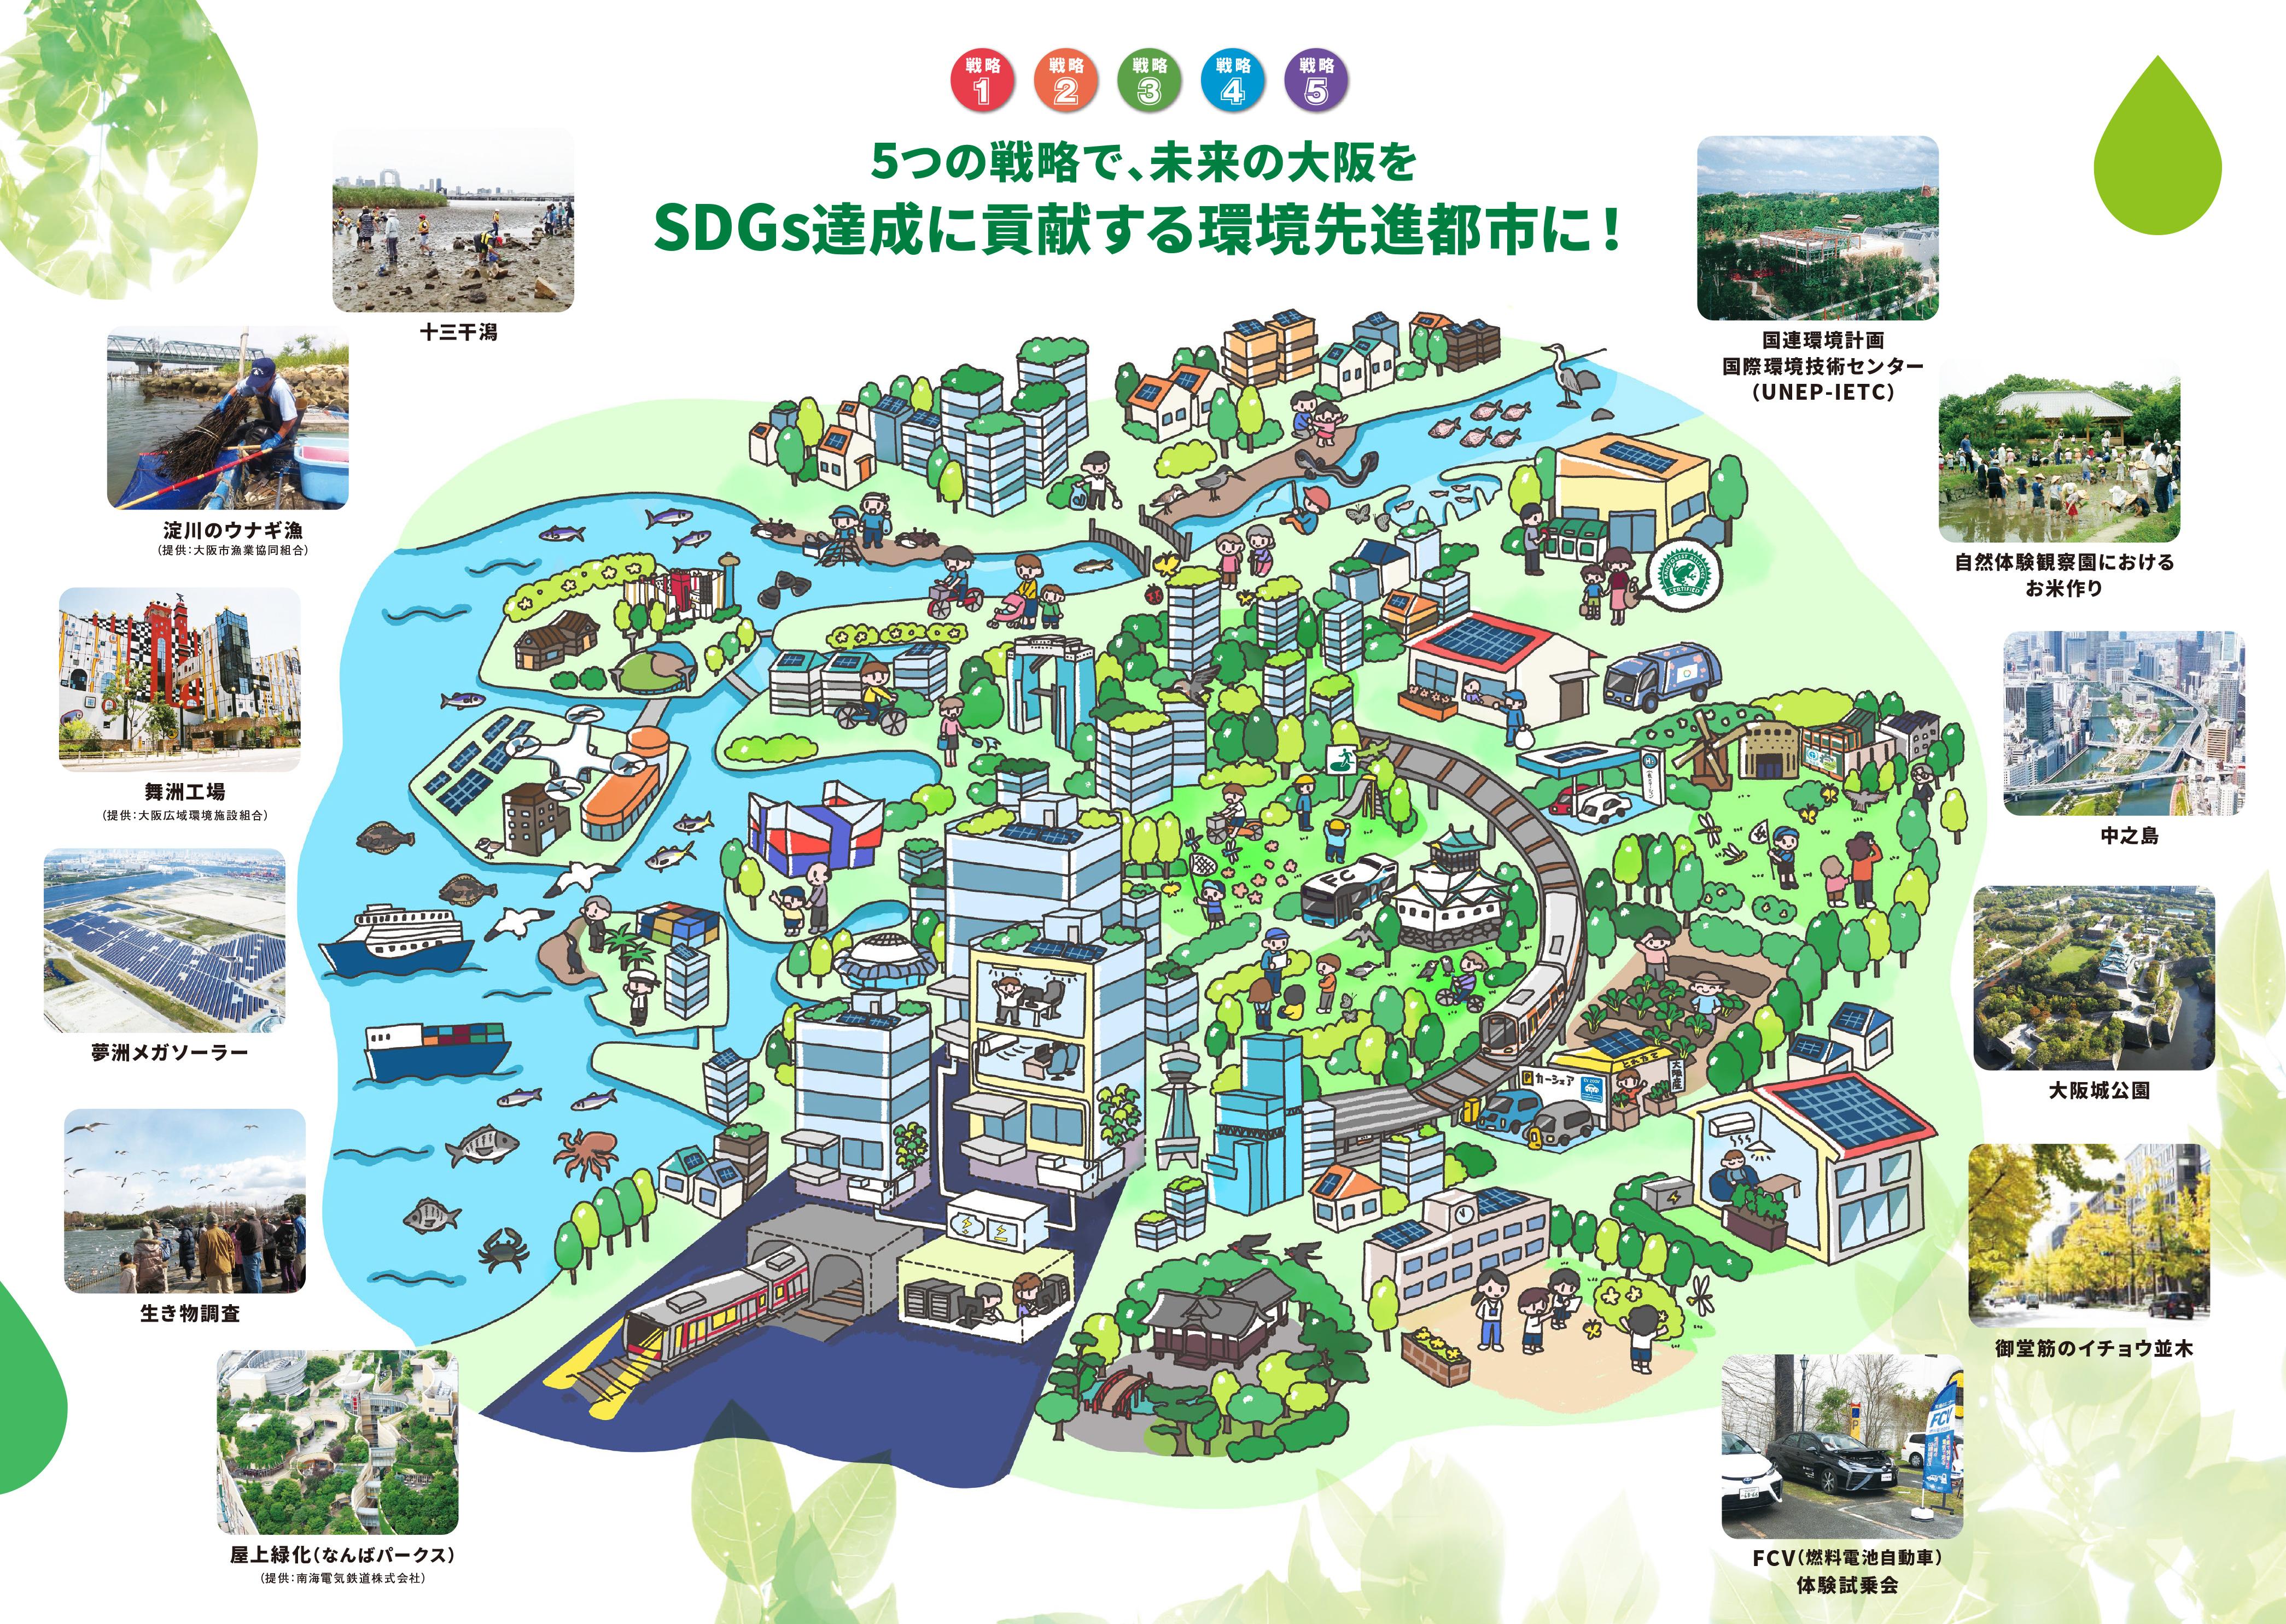 大阪市環境基本計画リーフレット|2019.12 策定(大阪市環境局)